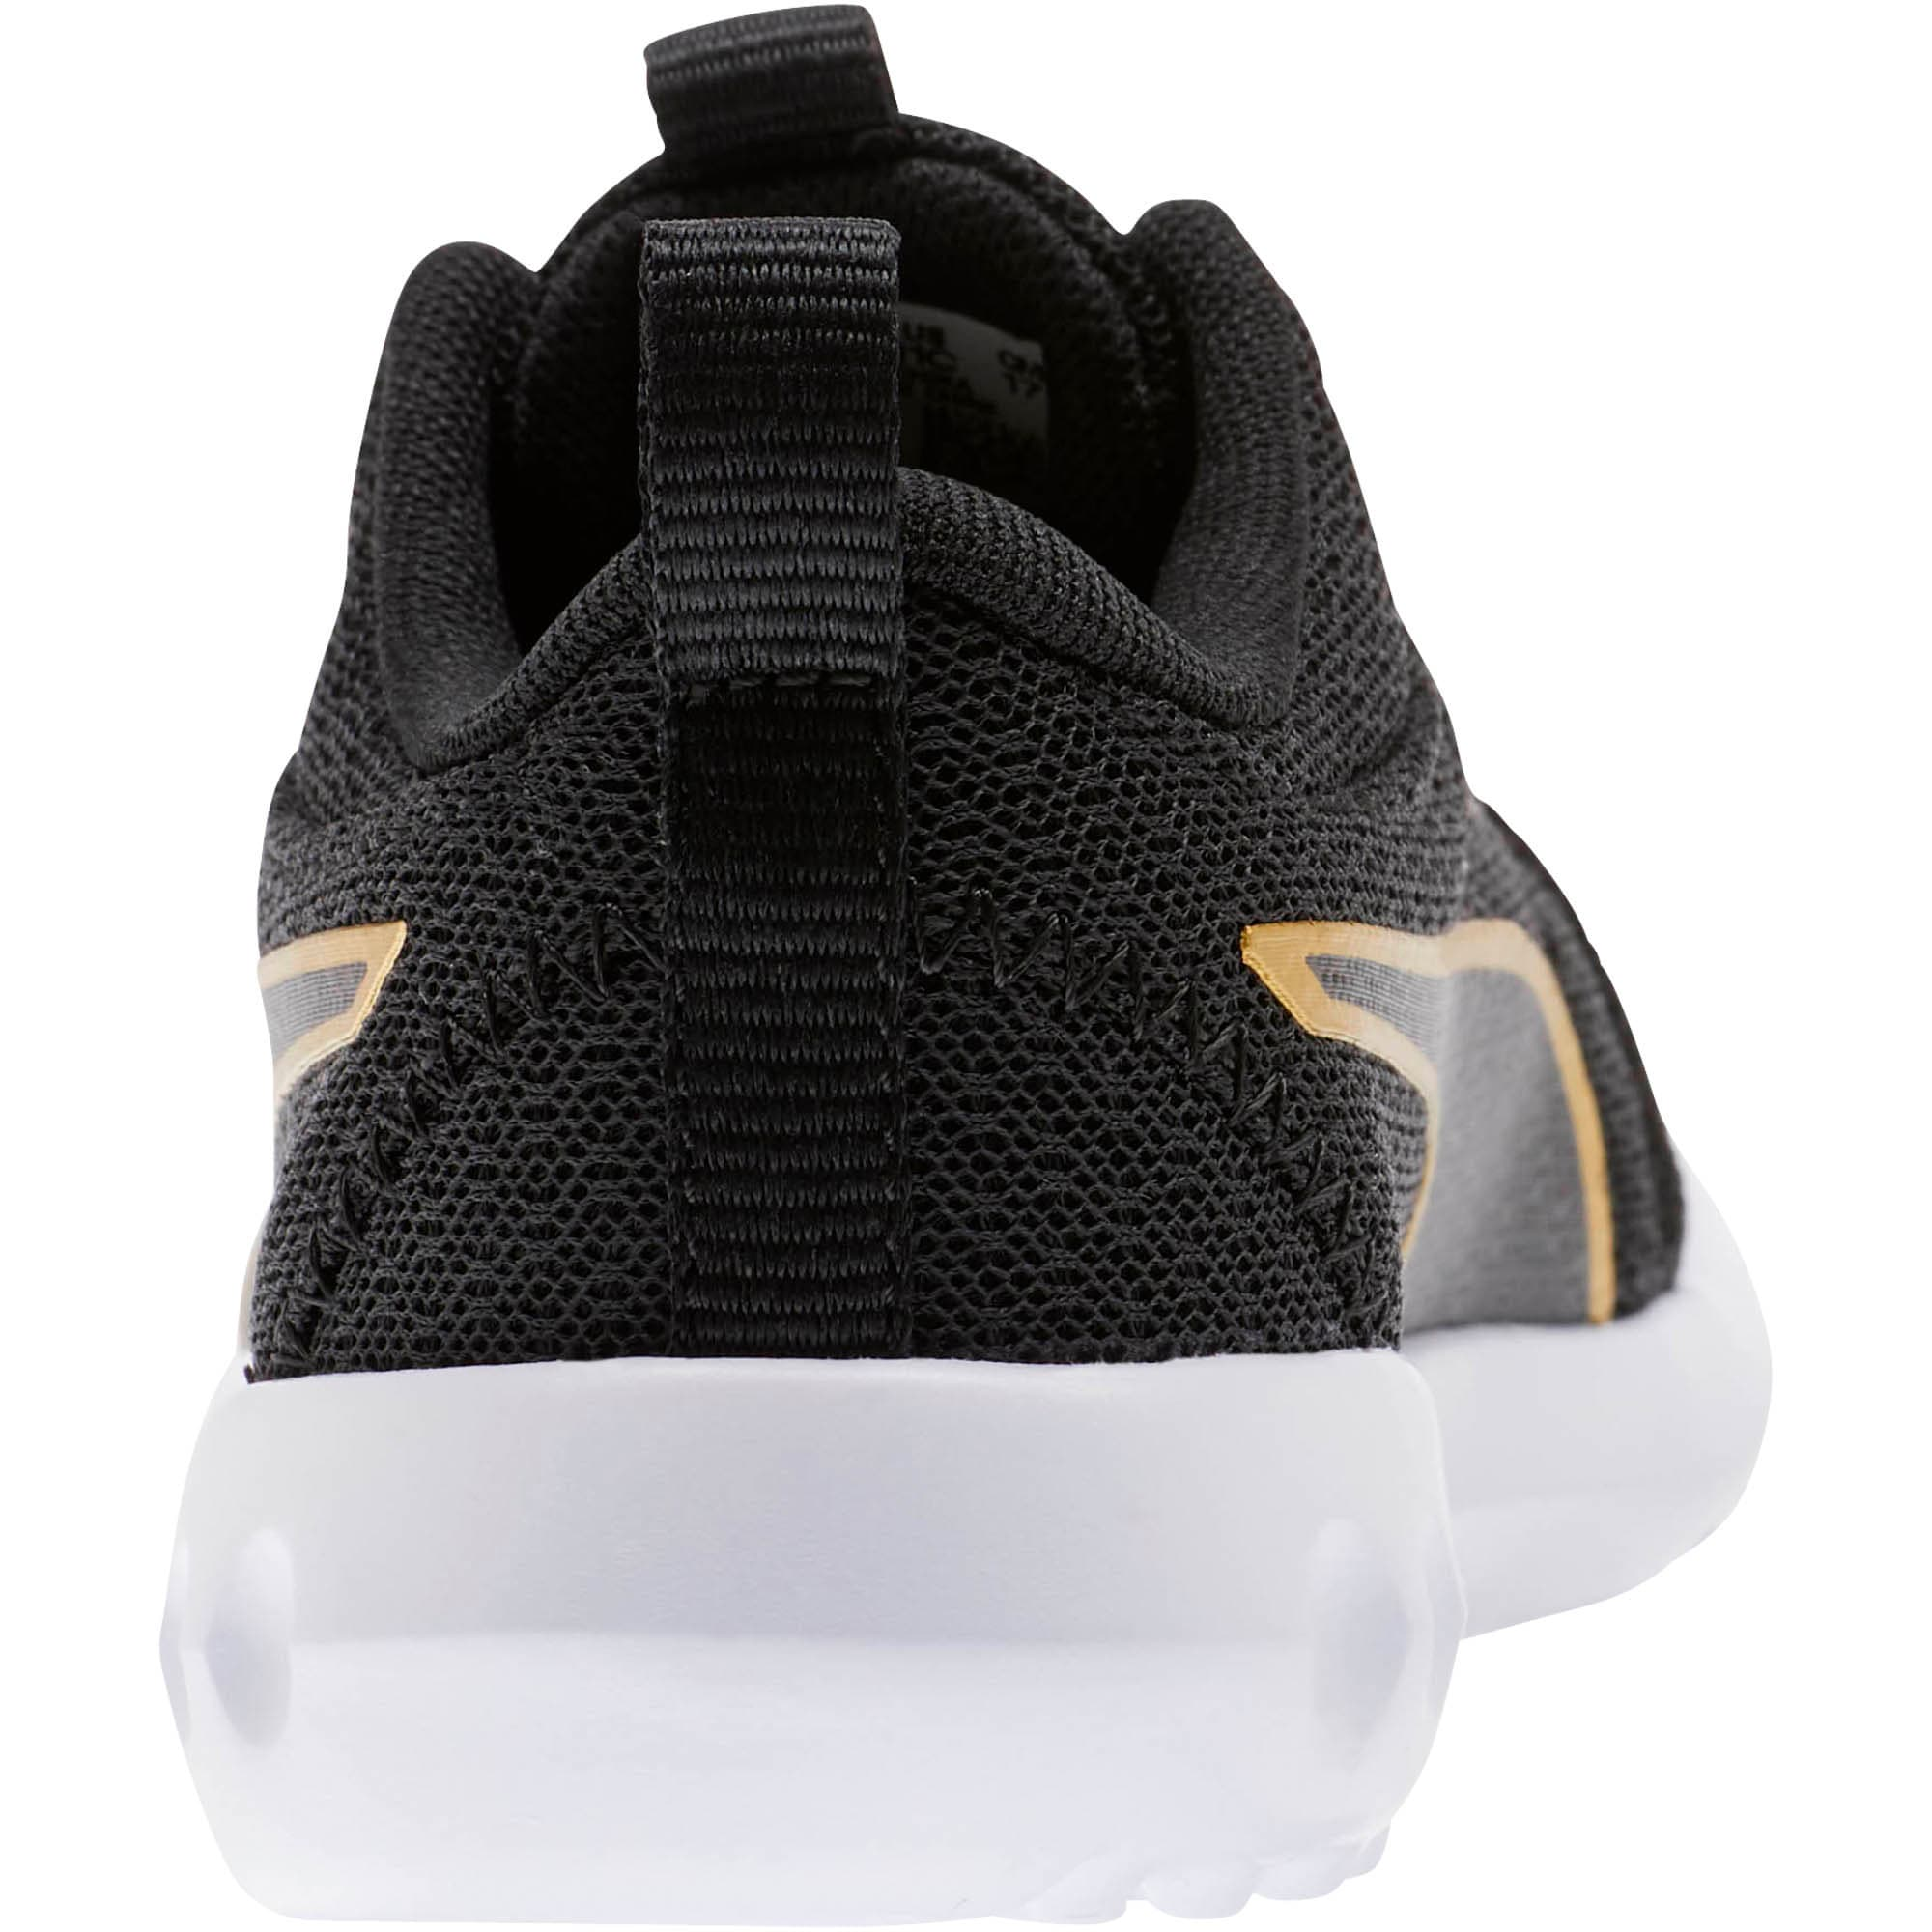 Thumbnail 3 of Carson 2 Metallic Mesh Little Kids' Shoes, Puma Black-Gold, medium